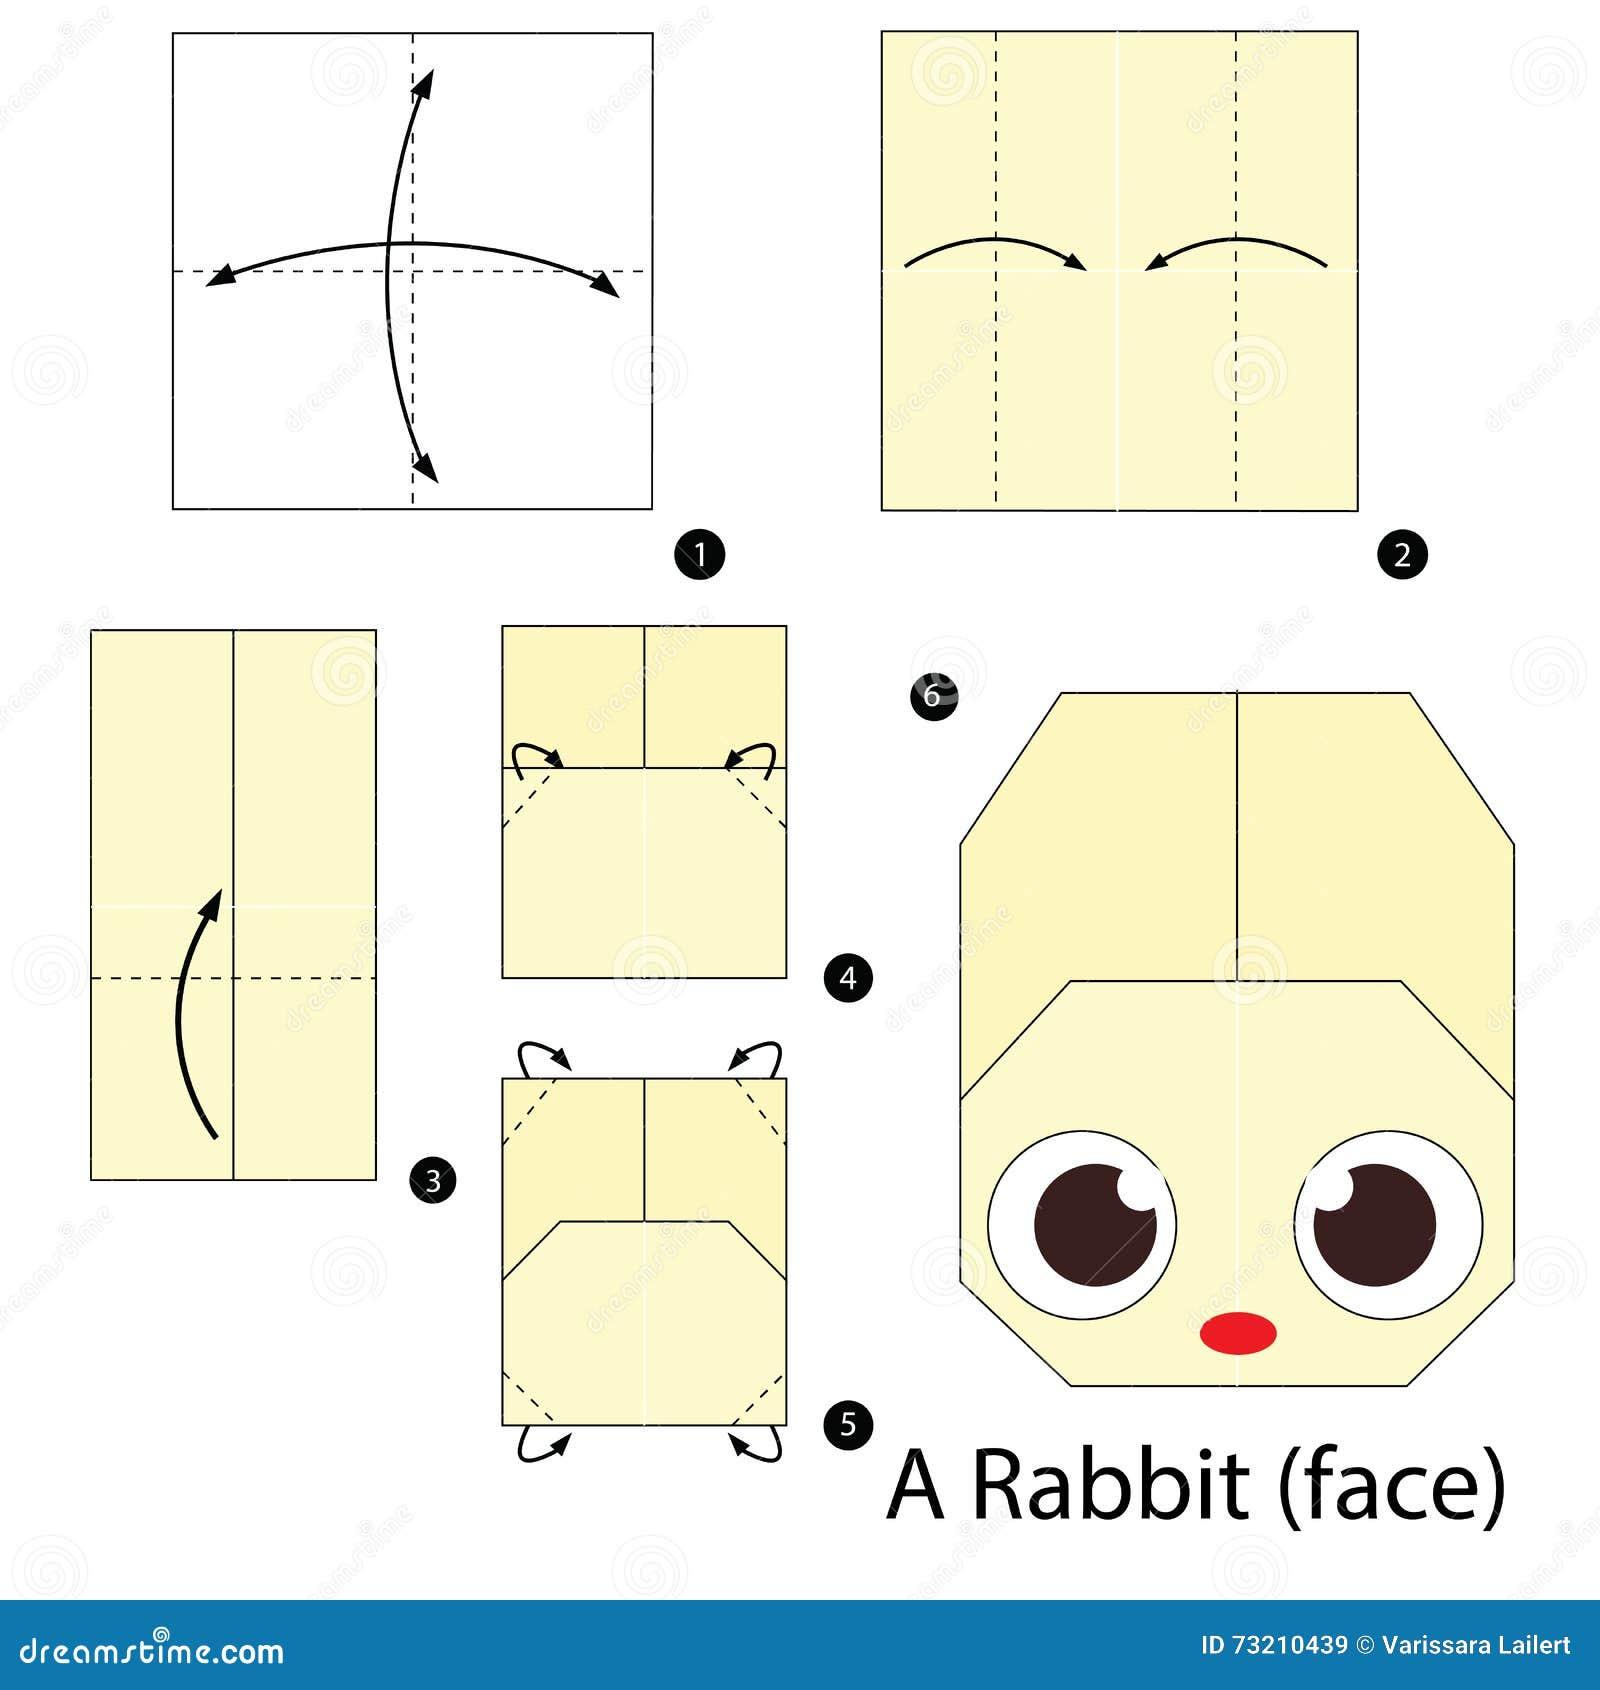 3d Origami Rabbit Instructions A Face Paper Origami Rabbit Face